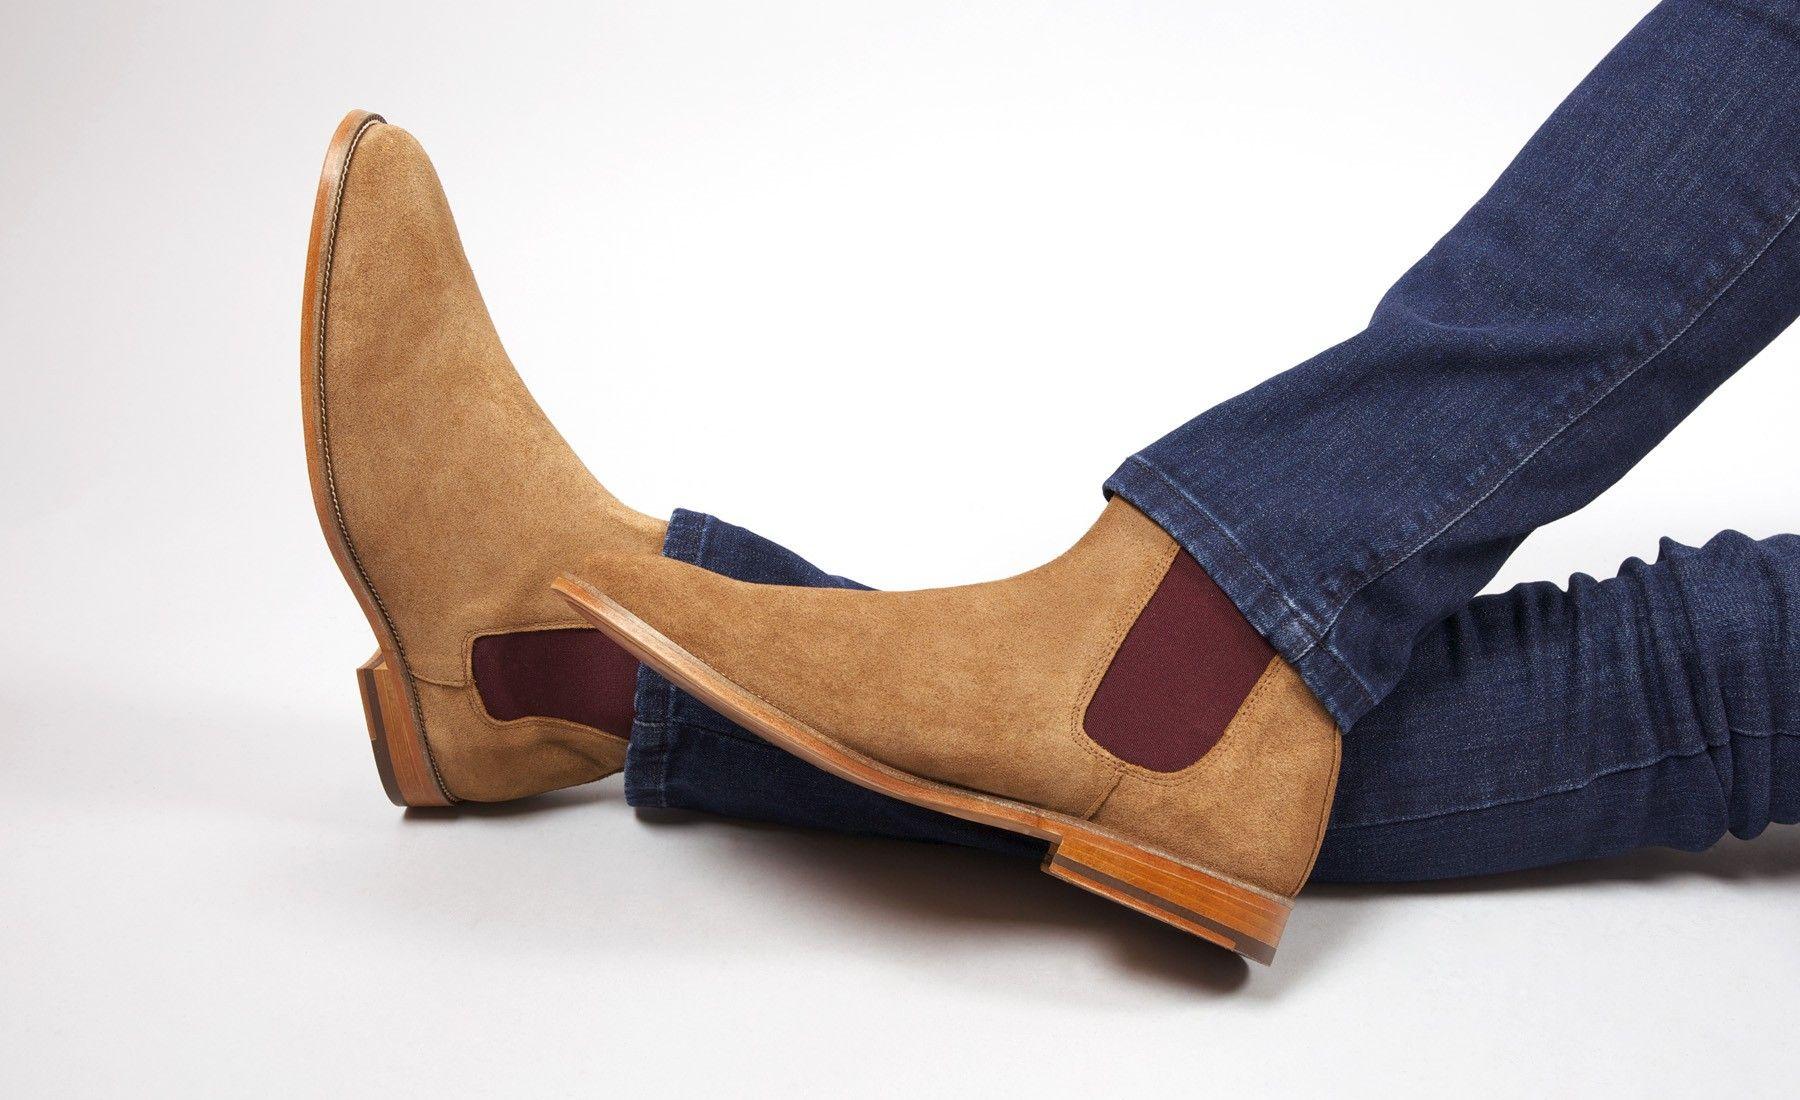 e9d0b3a4140e Chelsea boots savane   bordeaux - L Horloger - Bobbies